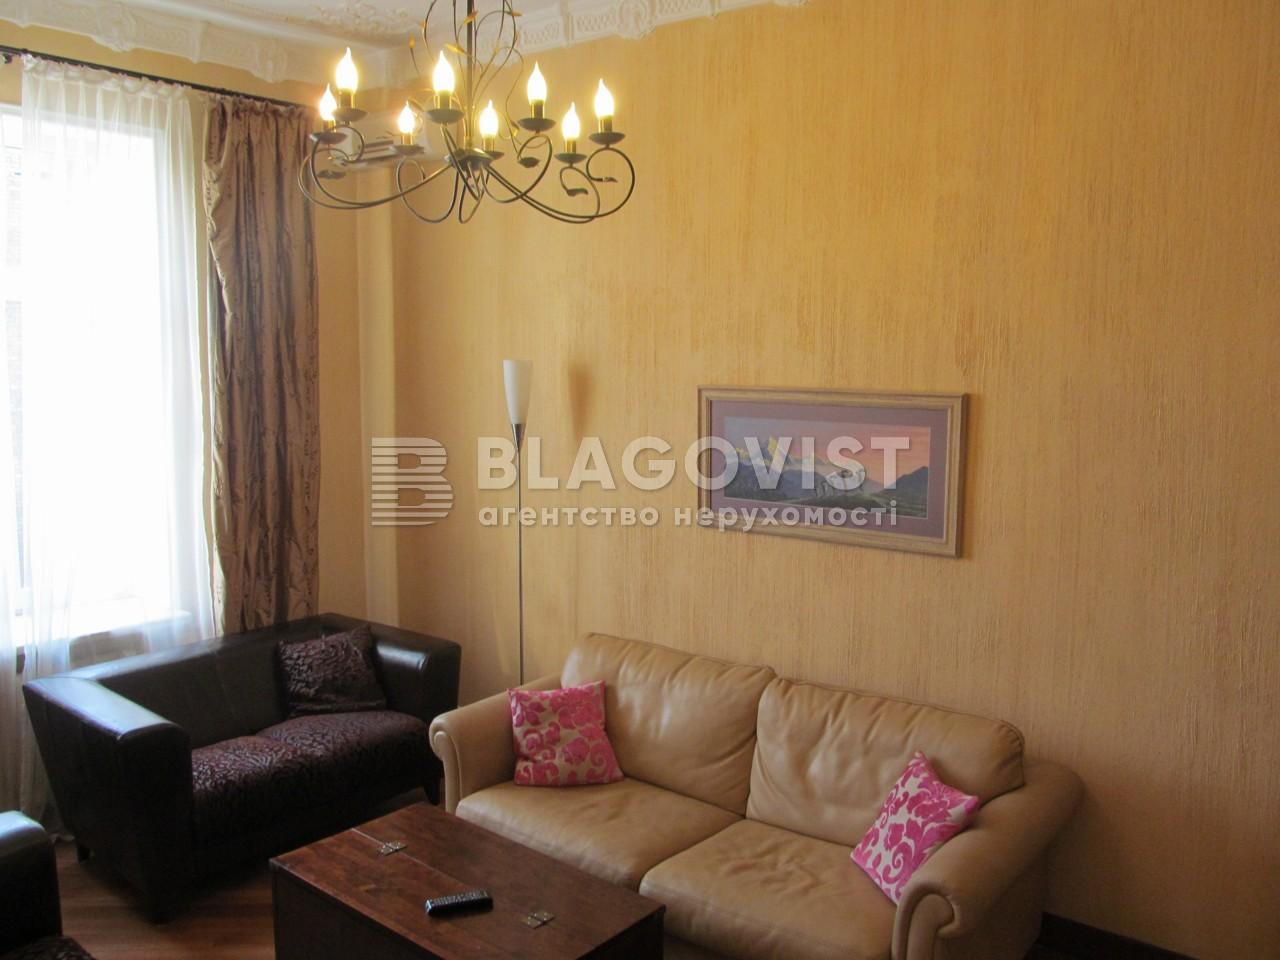 Квартира C-103021, Деловая (Димитрова), 13, Киев - Фото 4